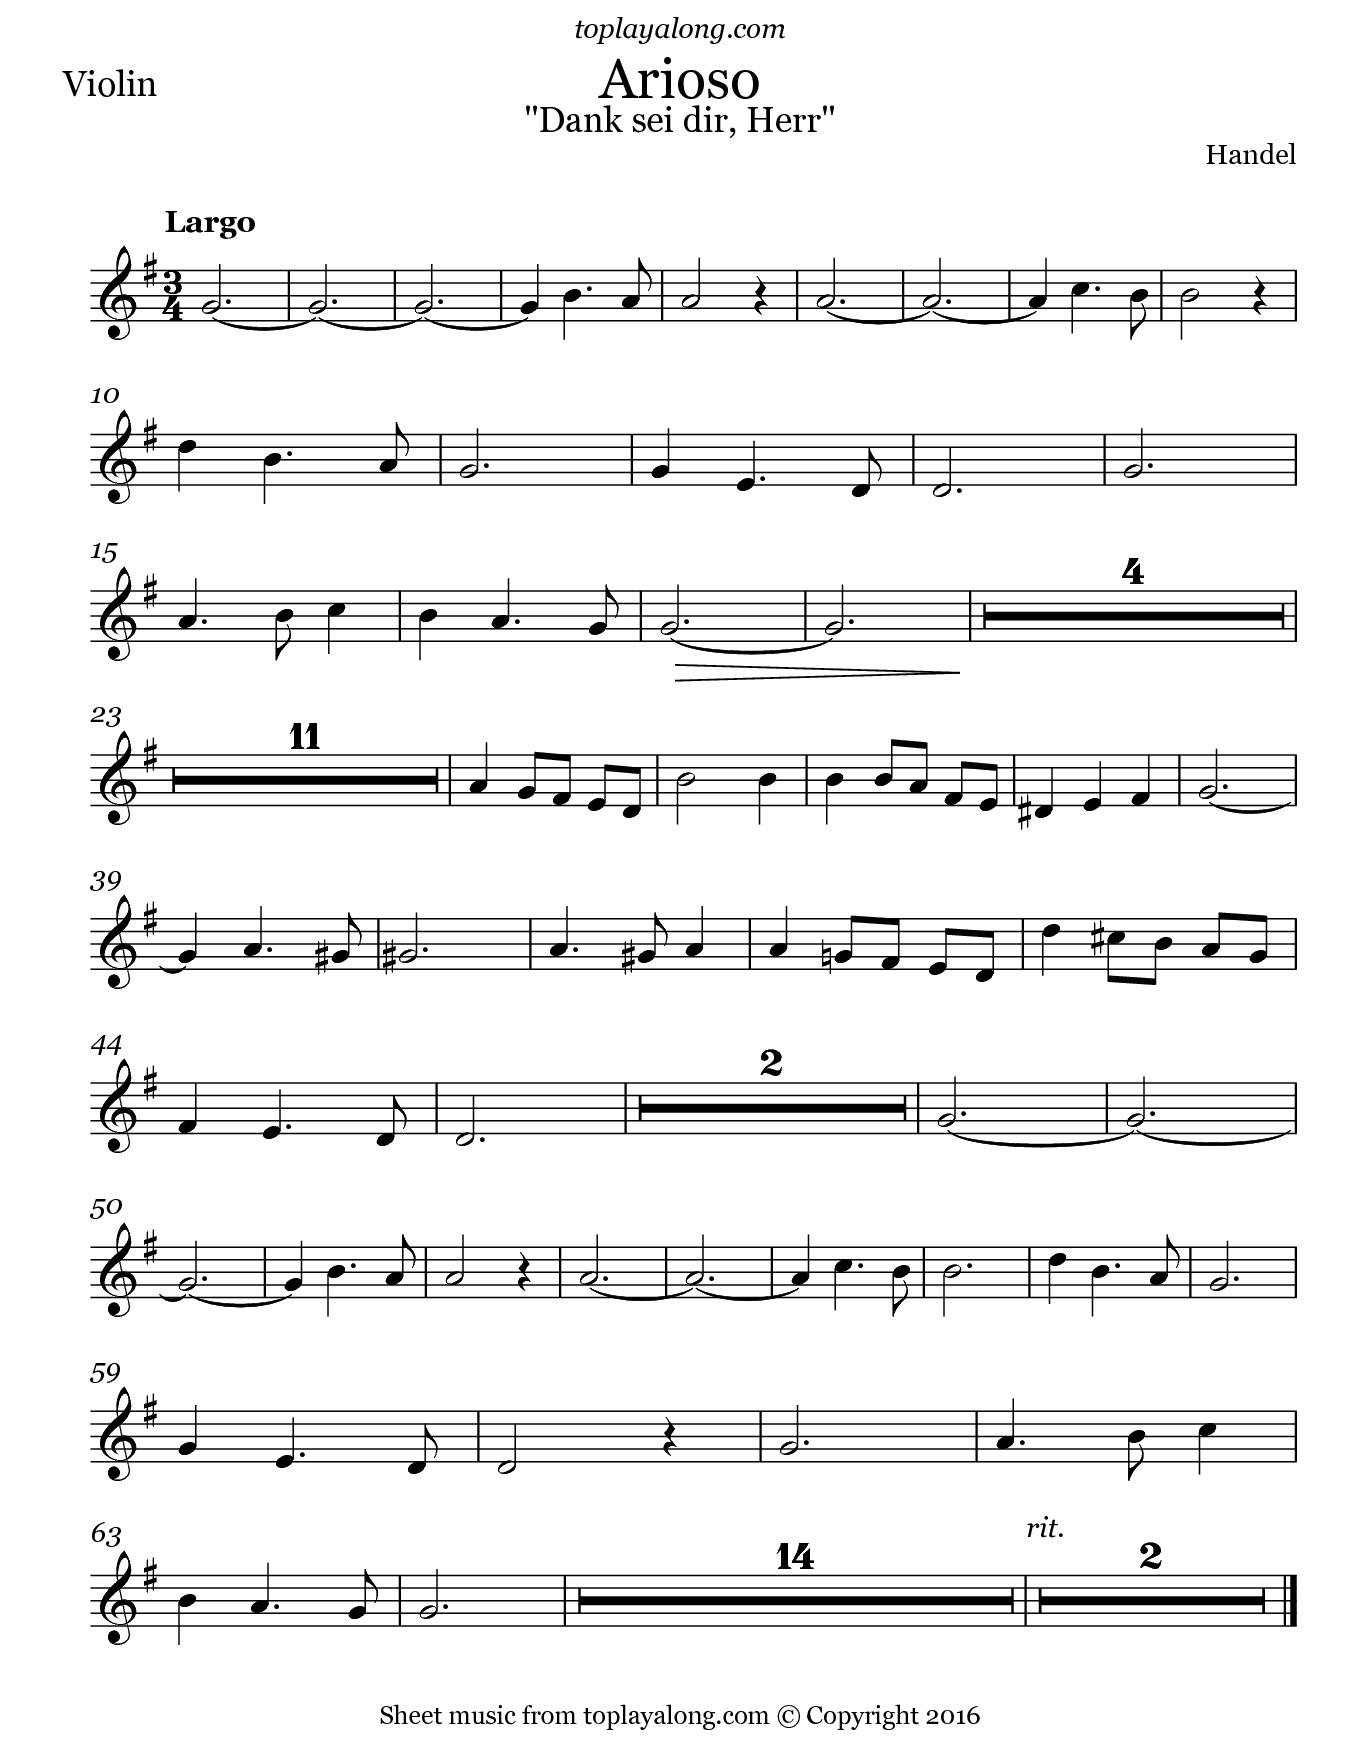 Arioso (Dank sei dir, Herr) by Handel. Sheet music for Violin, page 1.